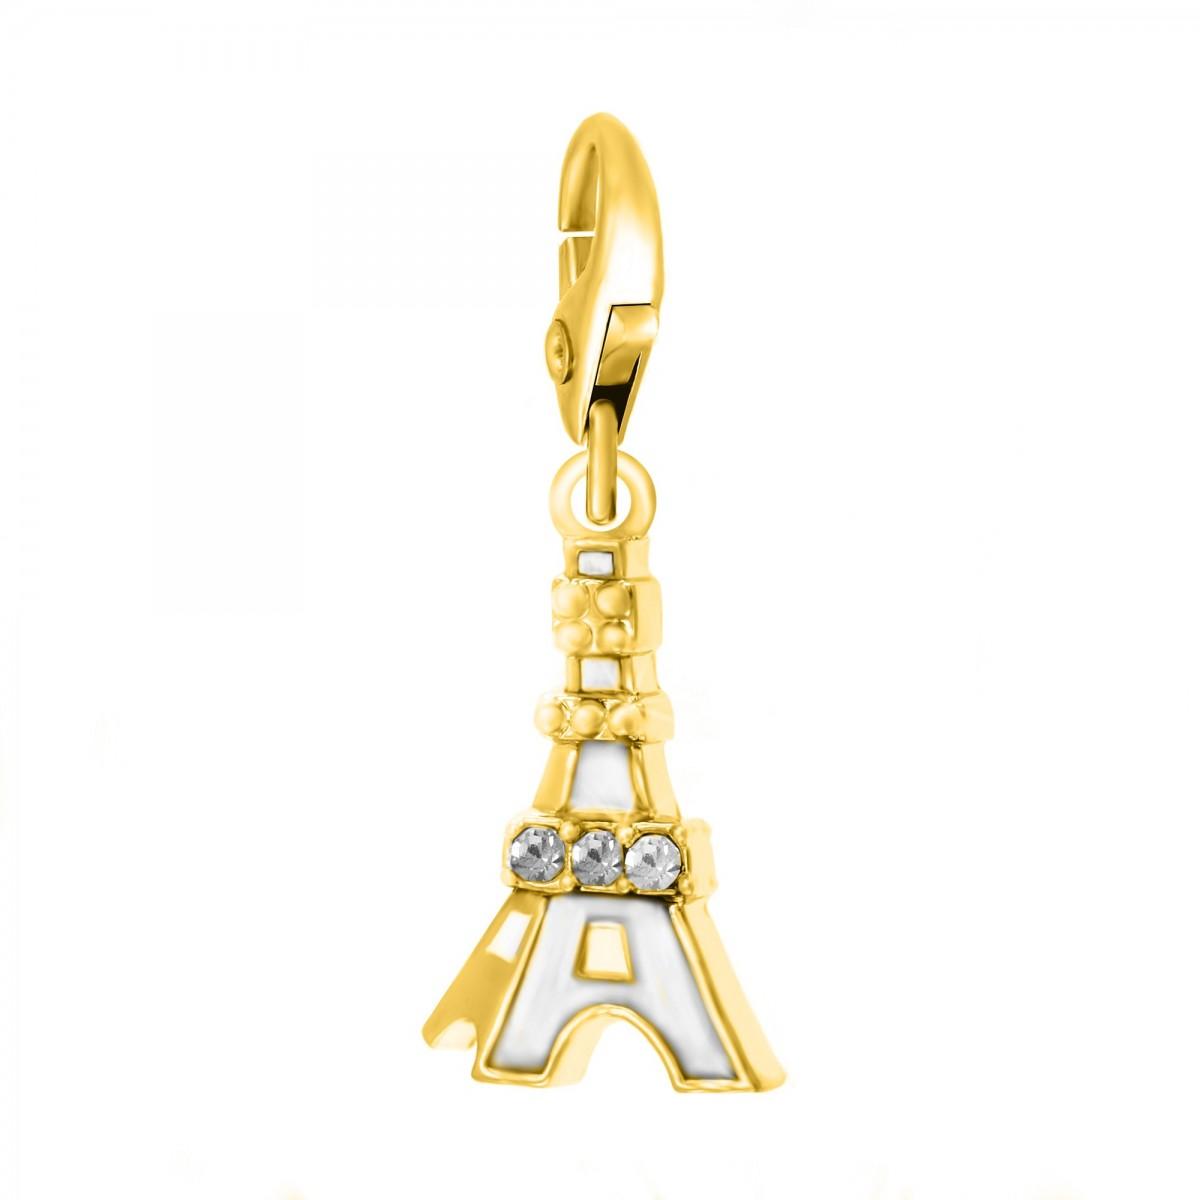 Charm Tour Eiffel doré So Charm made with Crystal from Swarovski